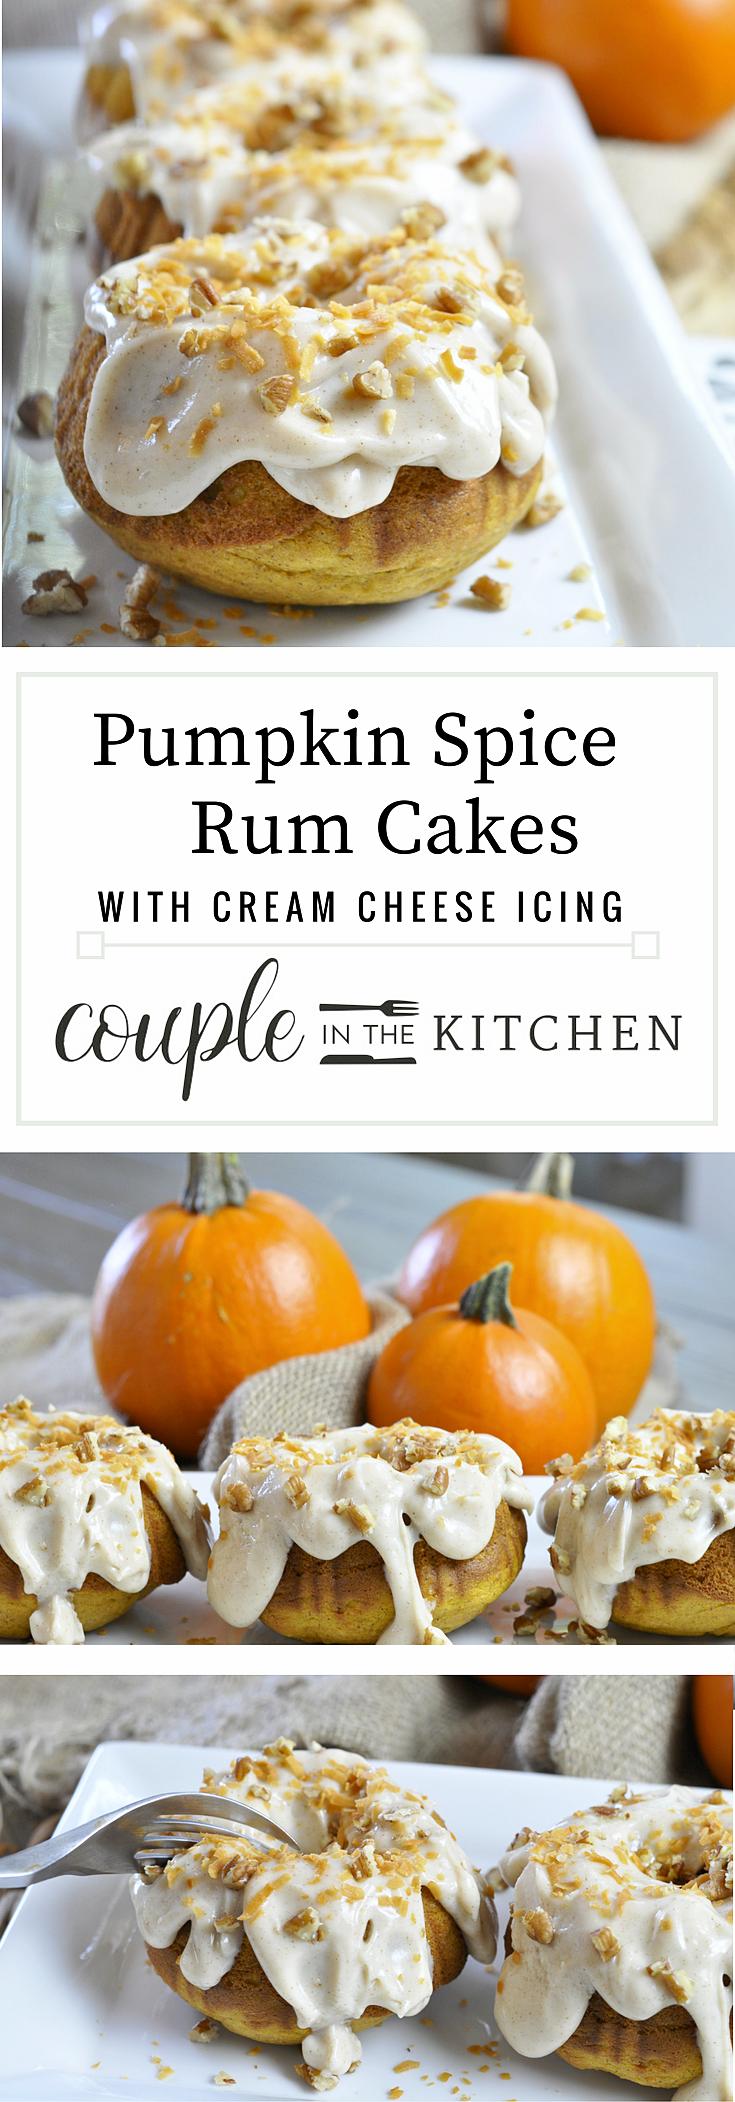 Pumpkin Spice Rum Cake | coupleinthekitchen.com.png